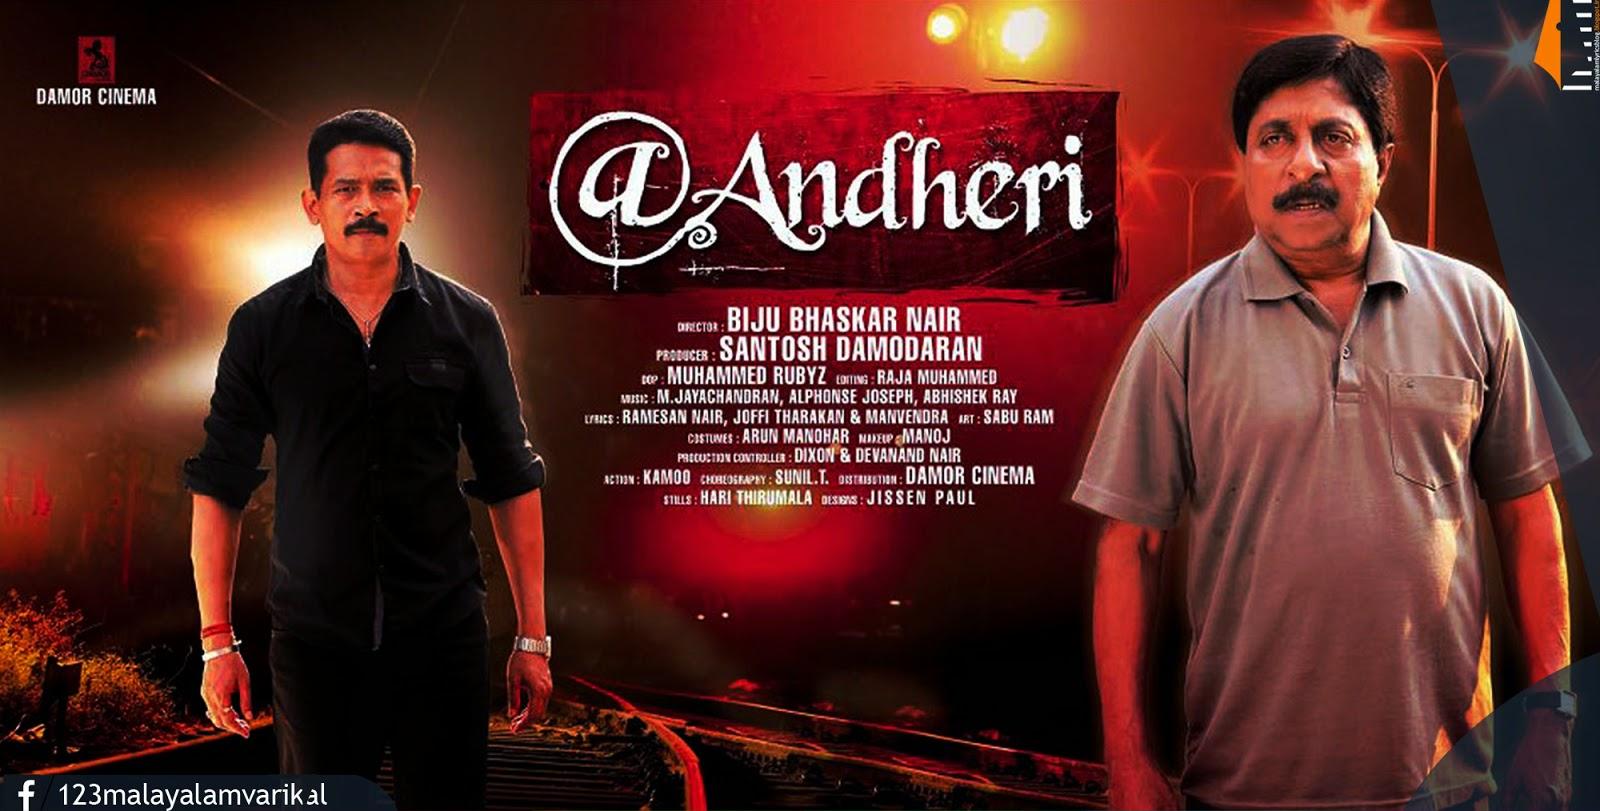 Malayalam movies download 2014